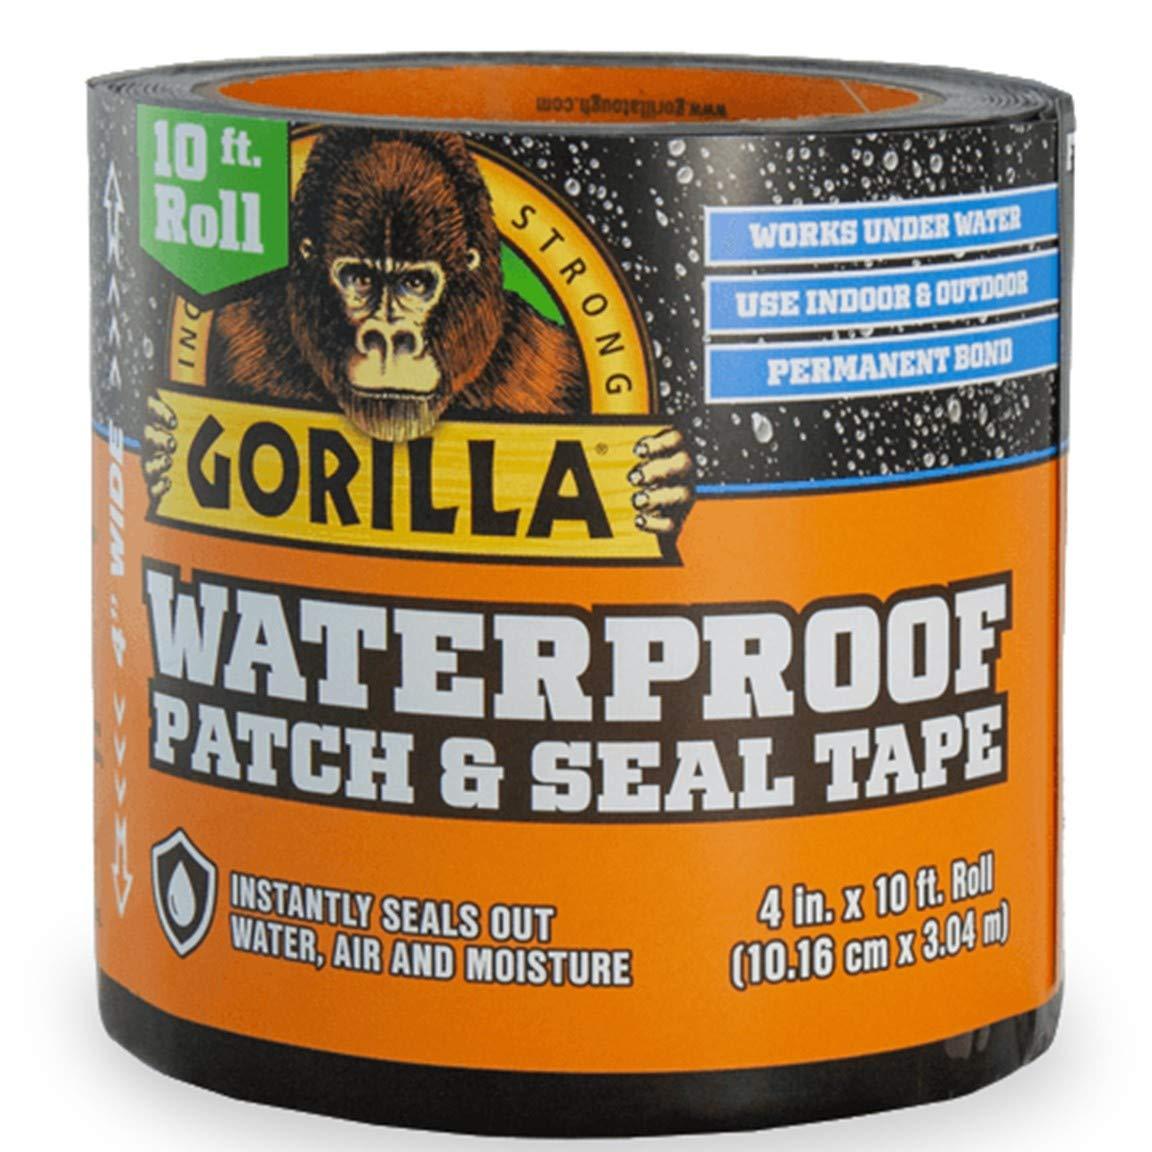 Gorilla 4612502 Waterproof Patch & Seal Tape 4'' x 10' Black, 1-Pack by Gorilla